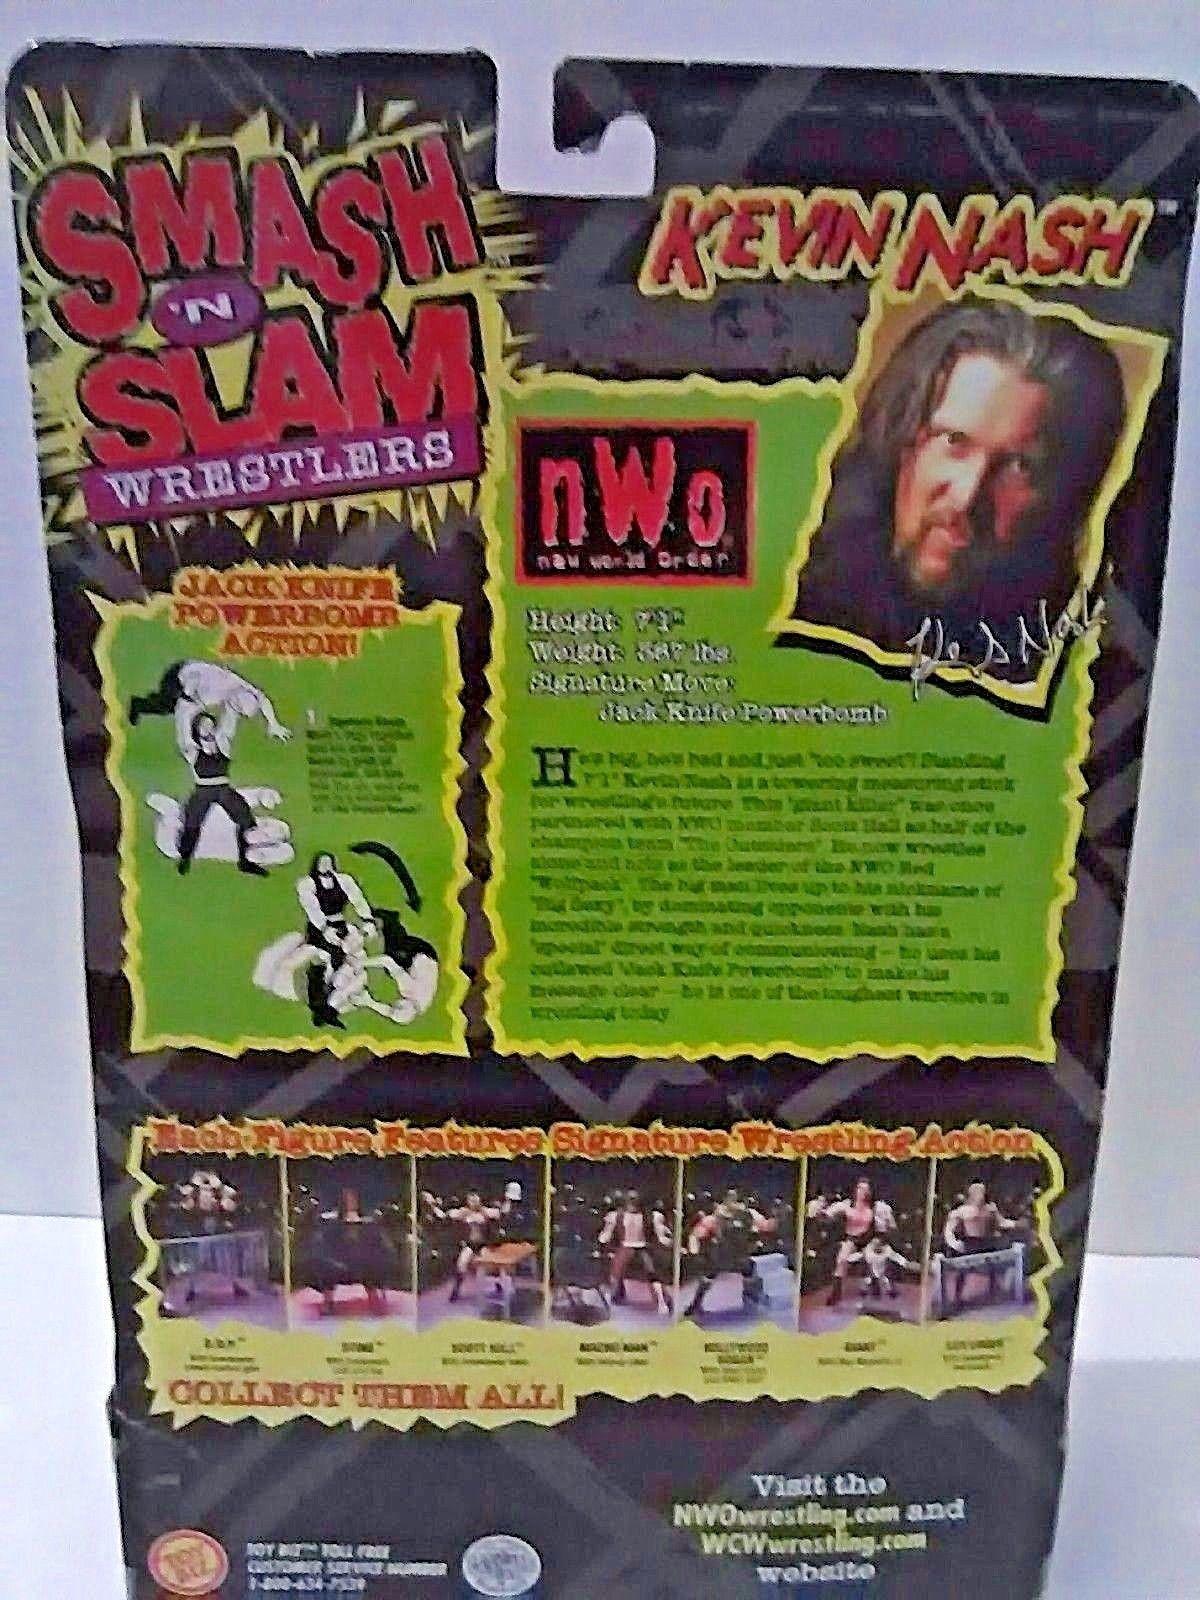 NWO Kevin Nash with Referee Accessory Figure Wrestler Power Bomb WCW Toy Biz